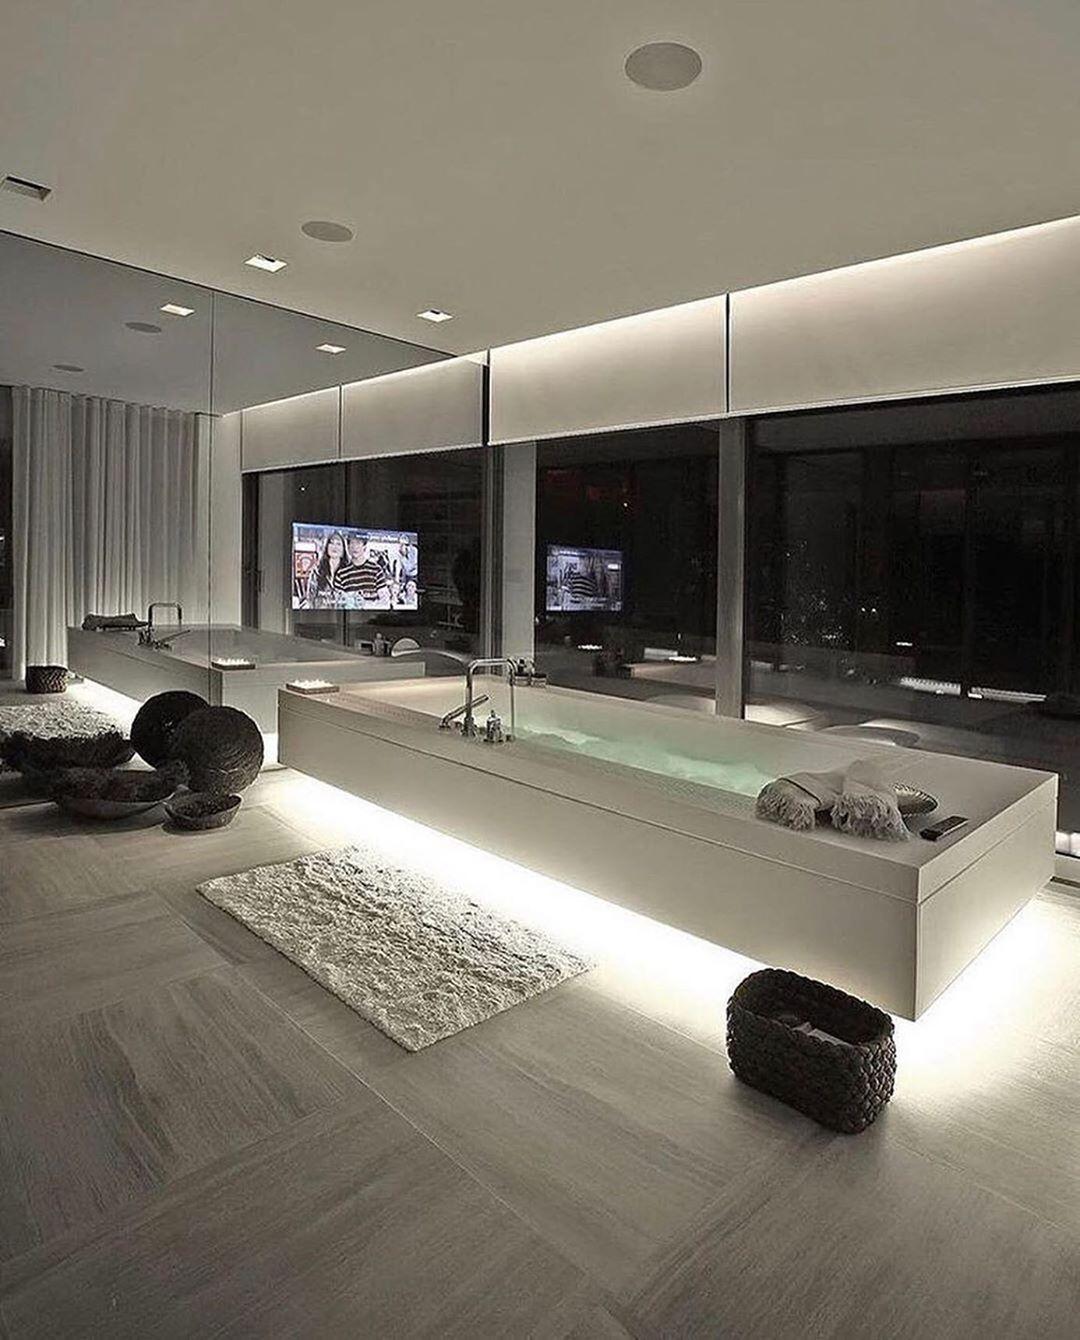 Perfect Modern Interior Follow Interiors Media For More Designed By Tanju Ozelgin Interio In 2020 Badezimmer Design Traumhafte Badezimmer Badezimmereinrichtung